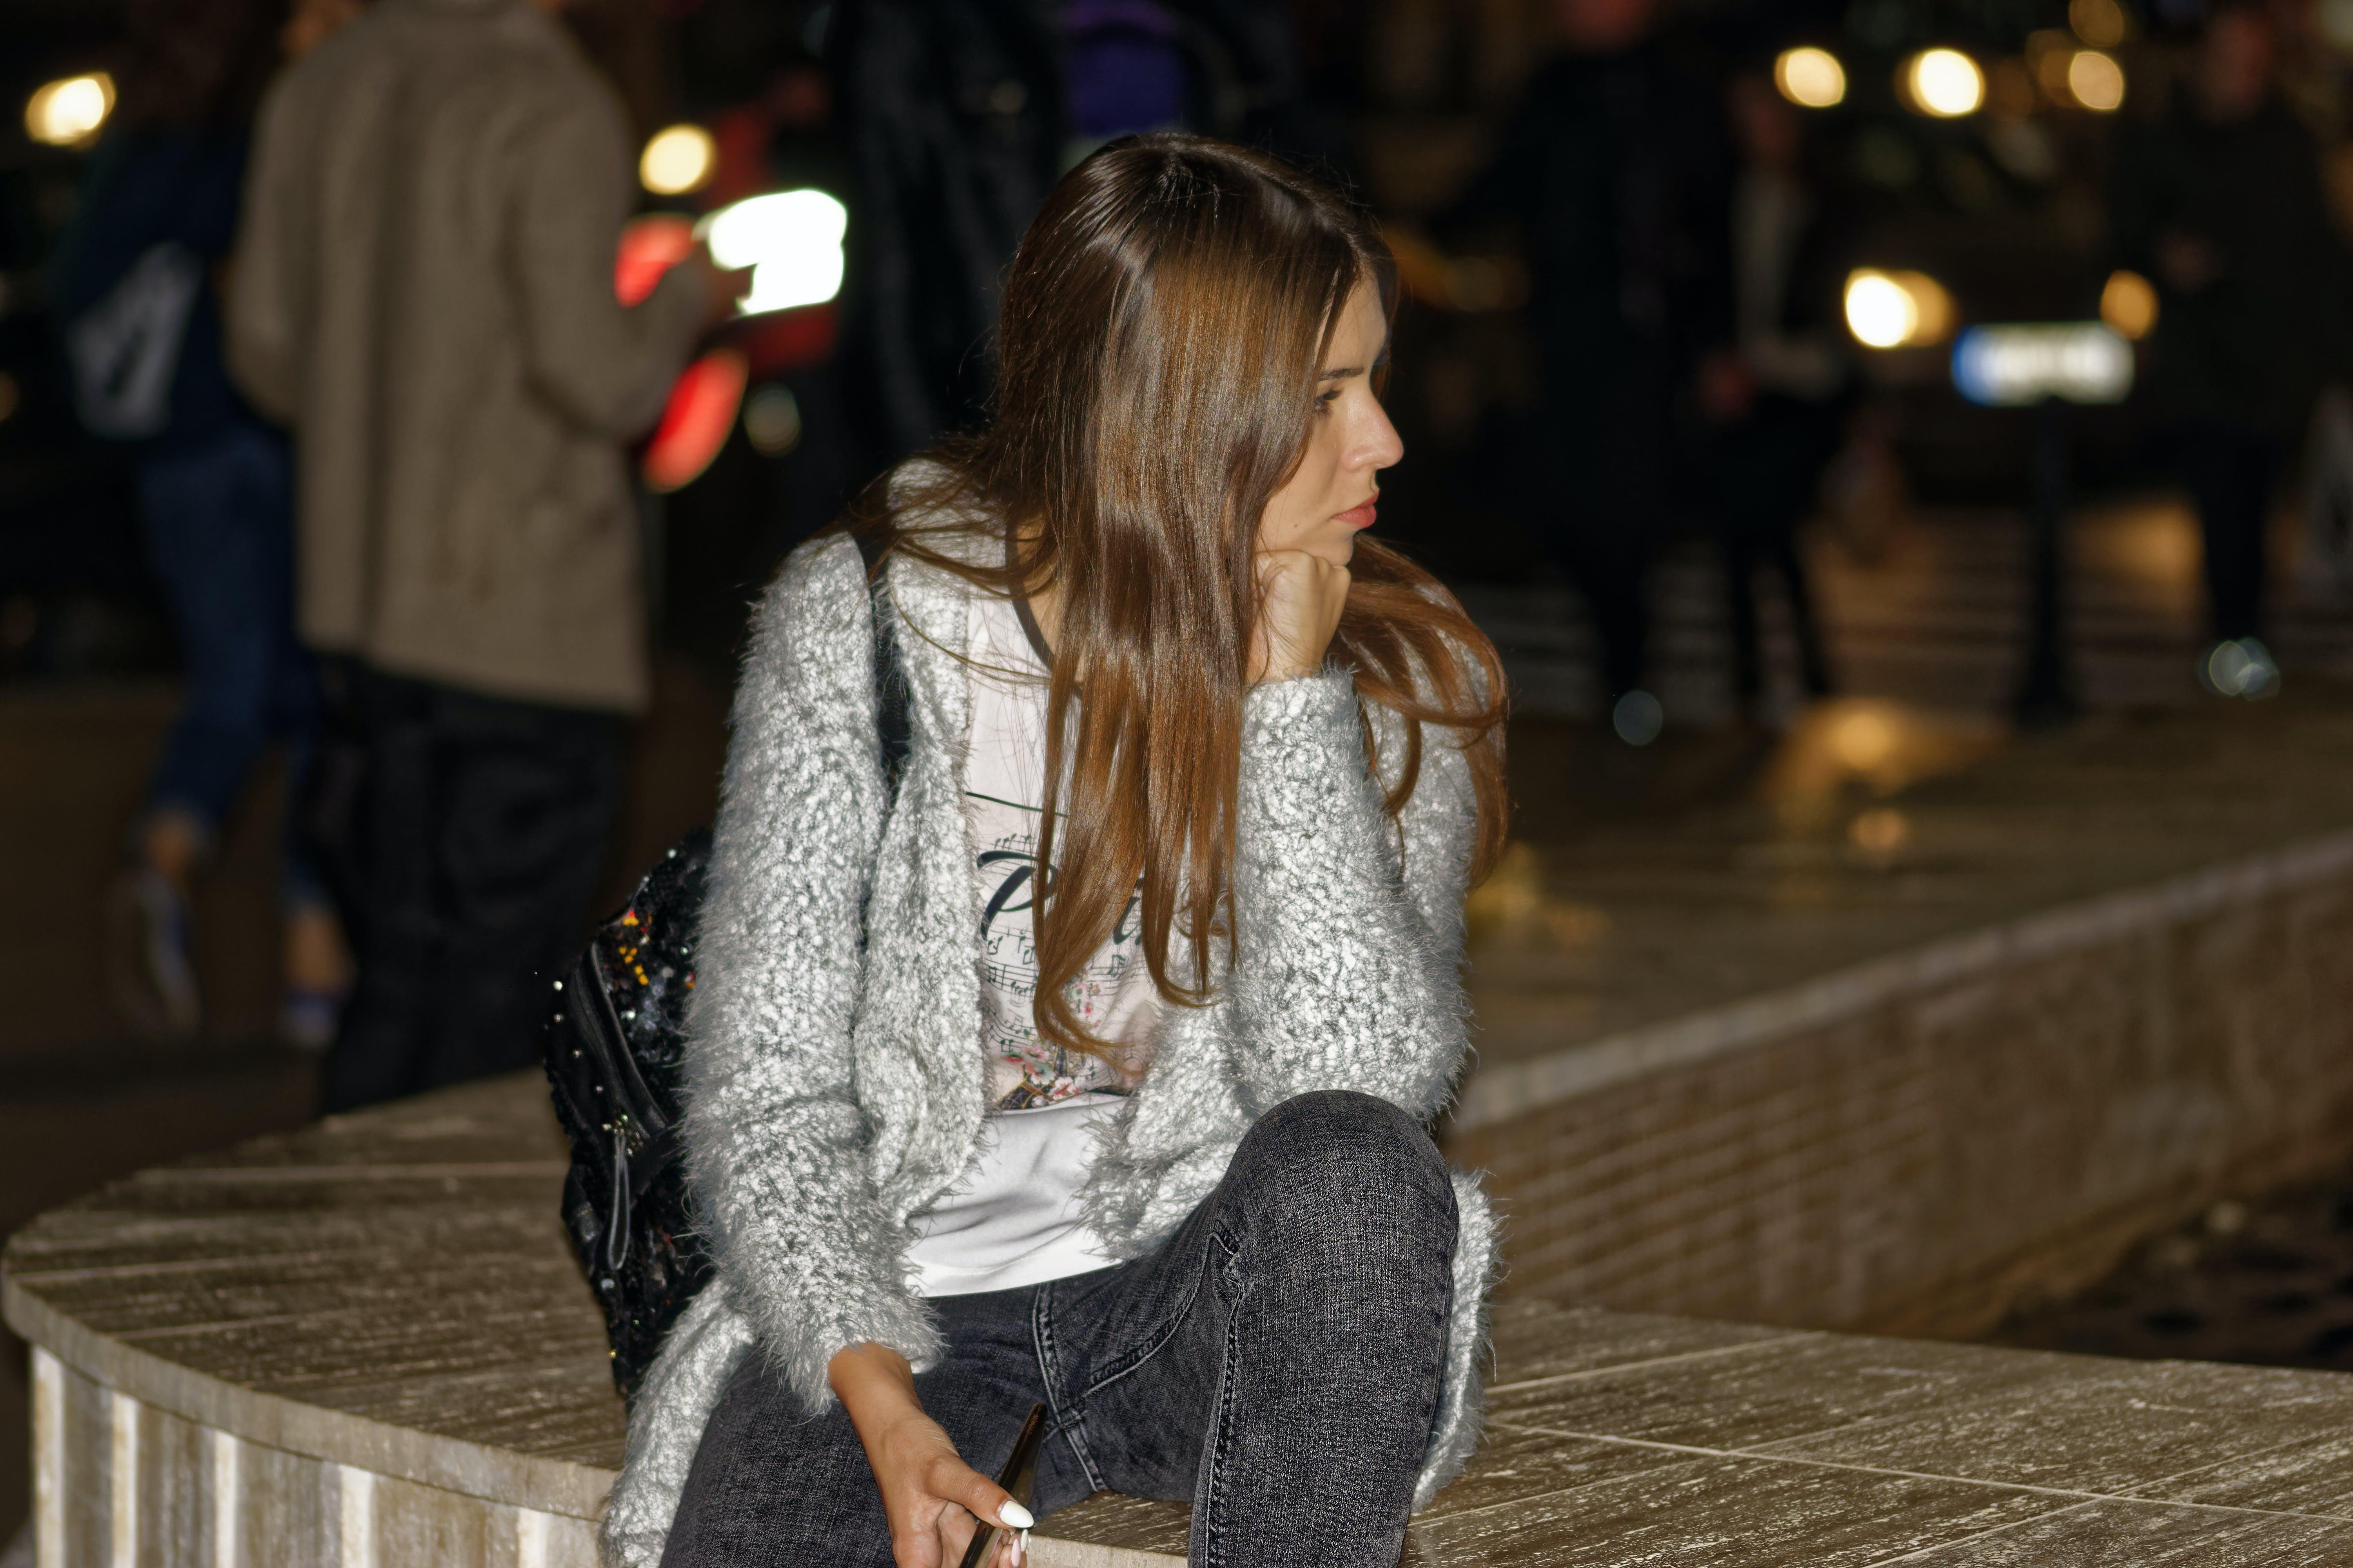 Free stock photo of city, girl, sitting, evening